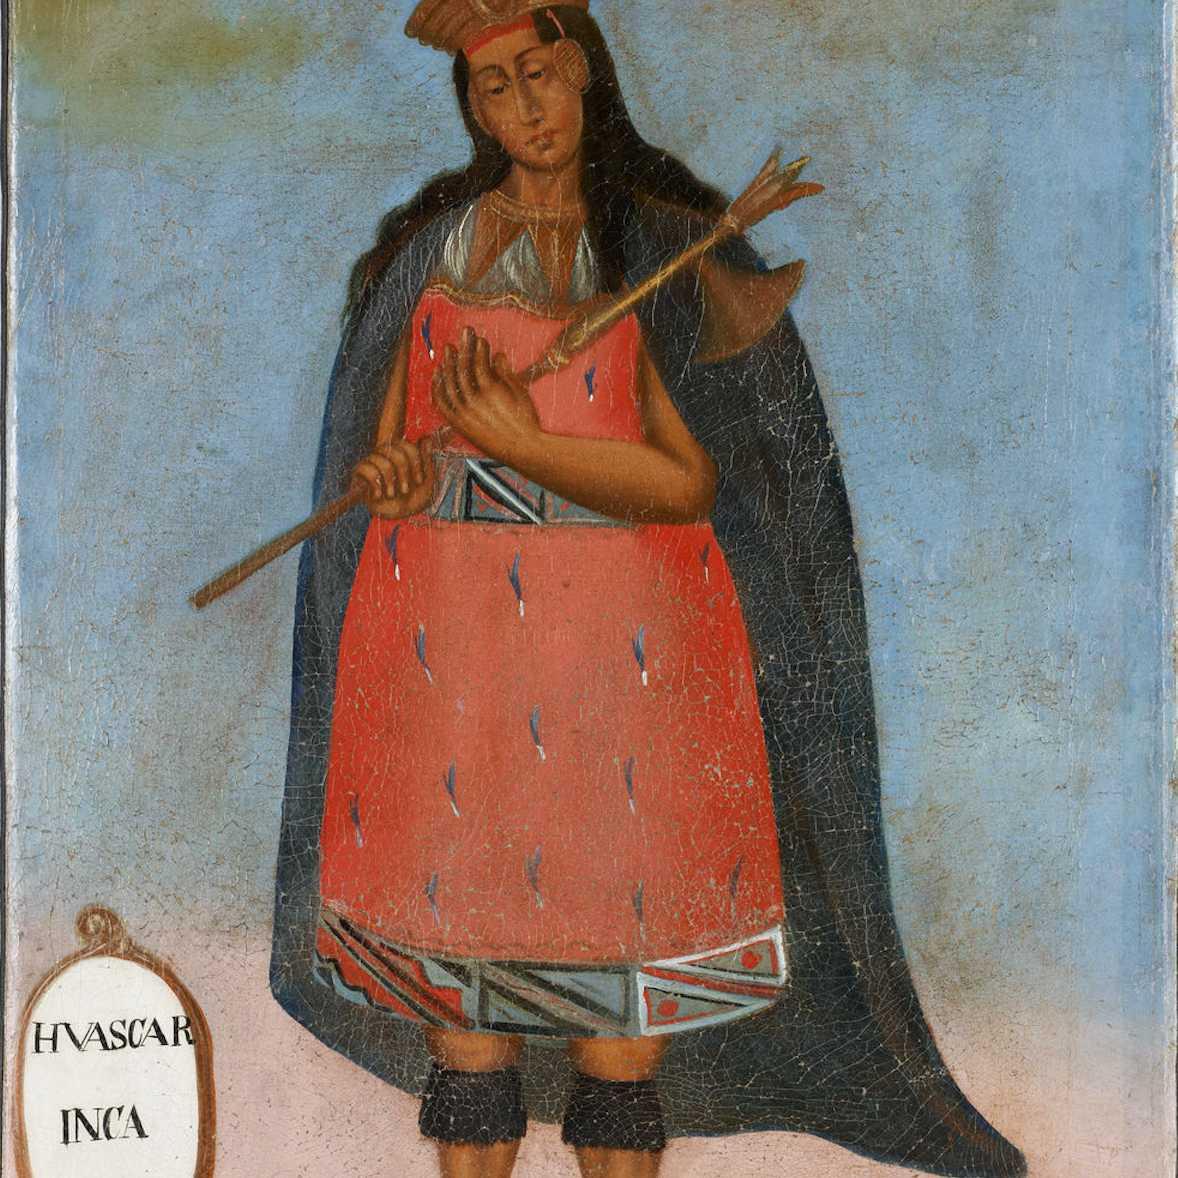 Portrait of Huáscar